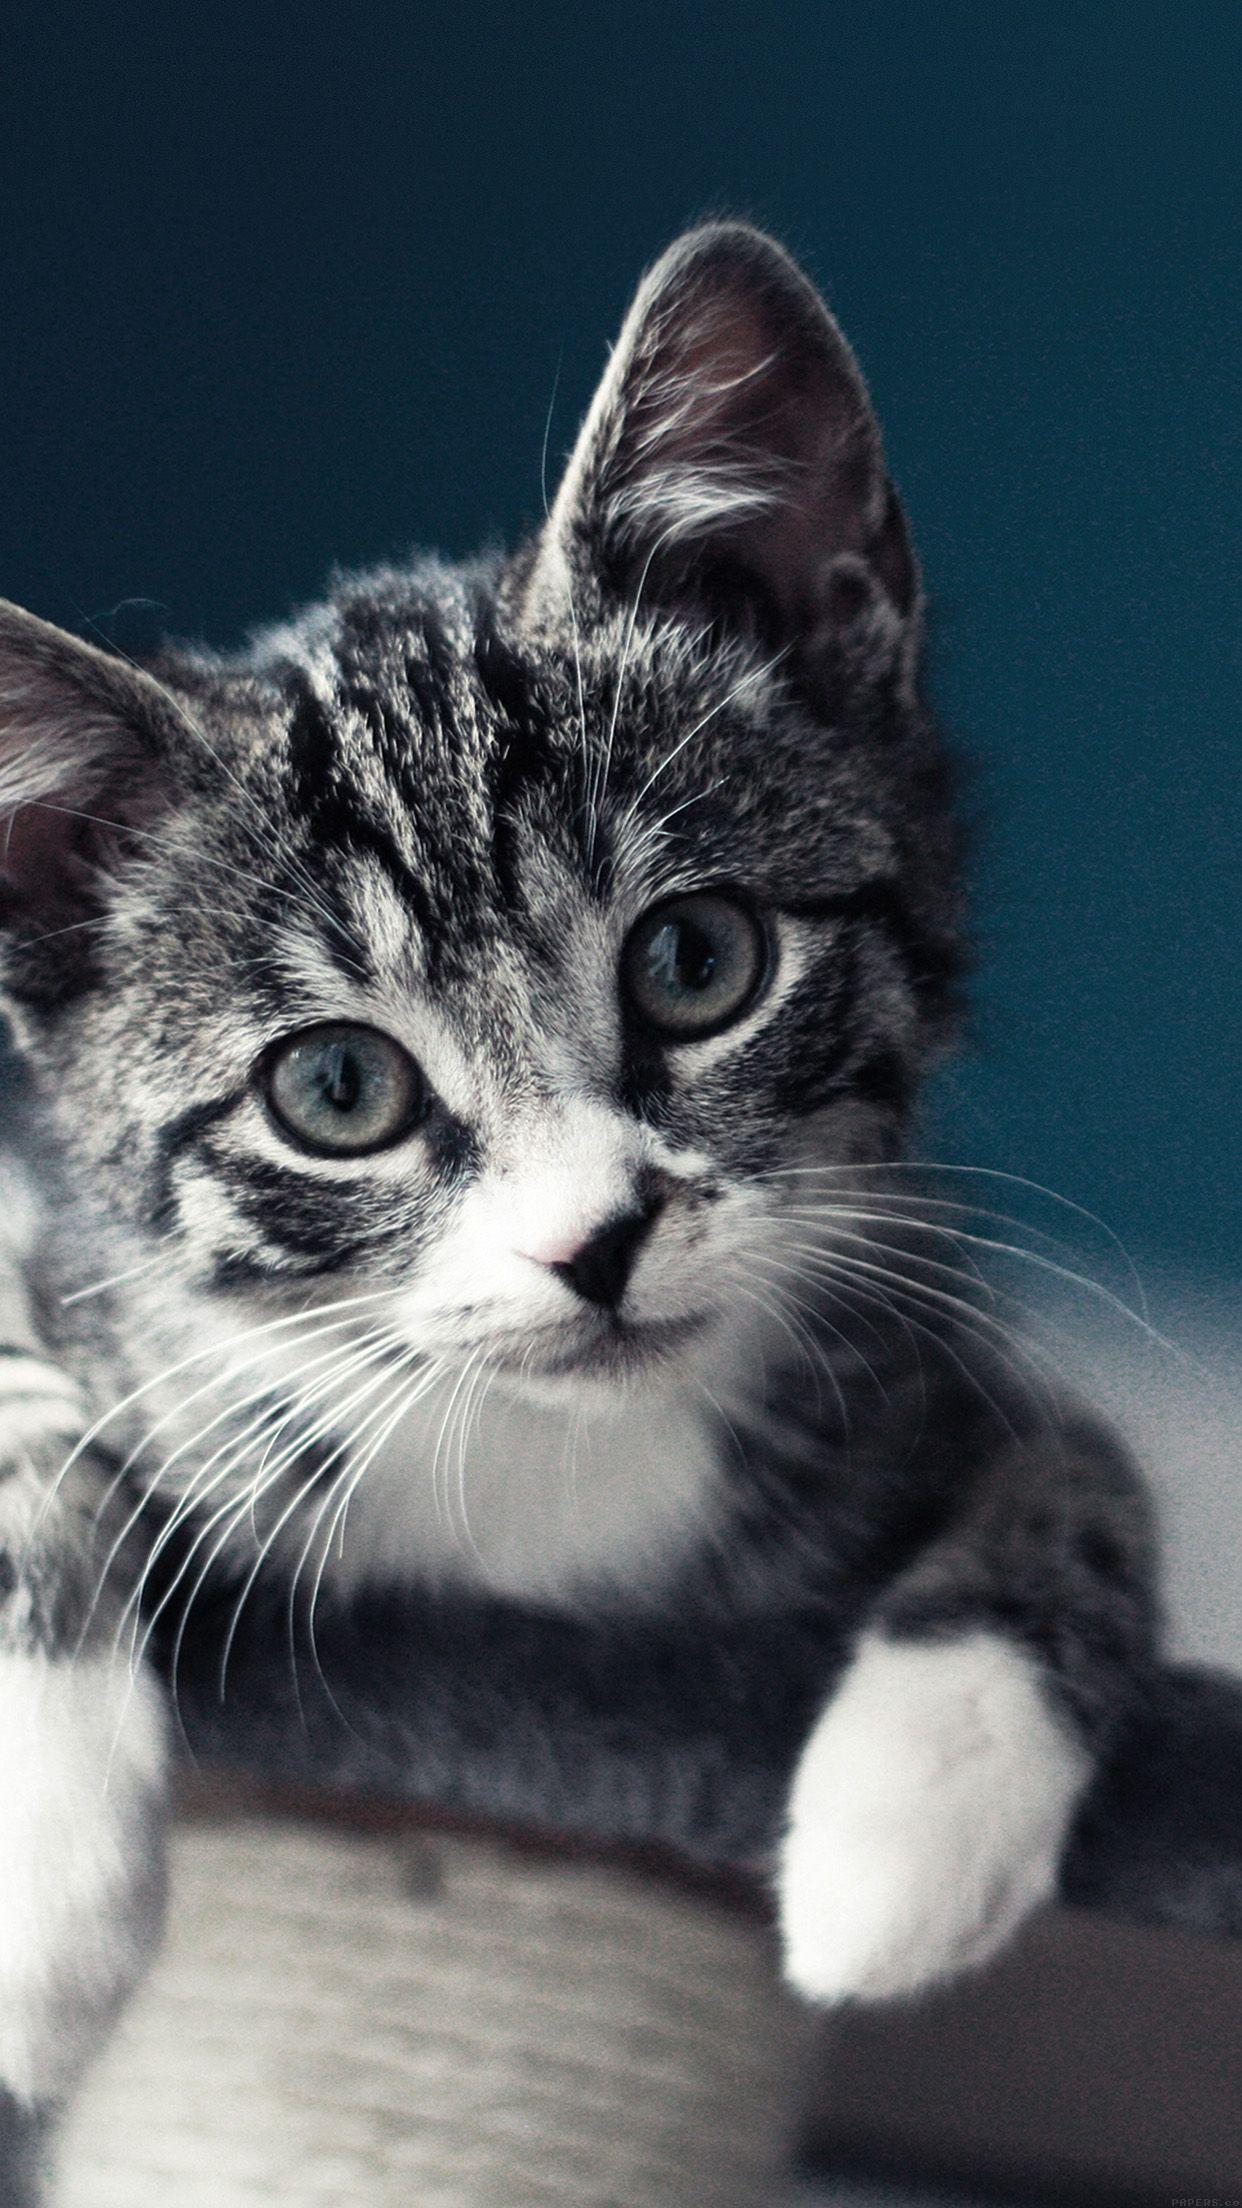 Apple Iphone Fond D Ecran Hd Cute Cats Cute Animals Pretty Cats